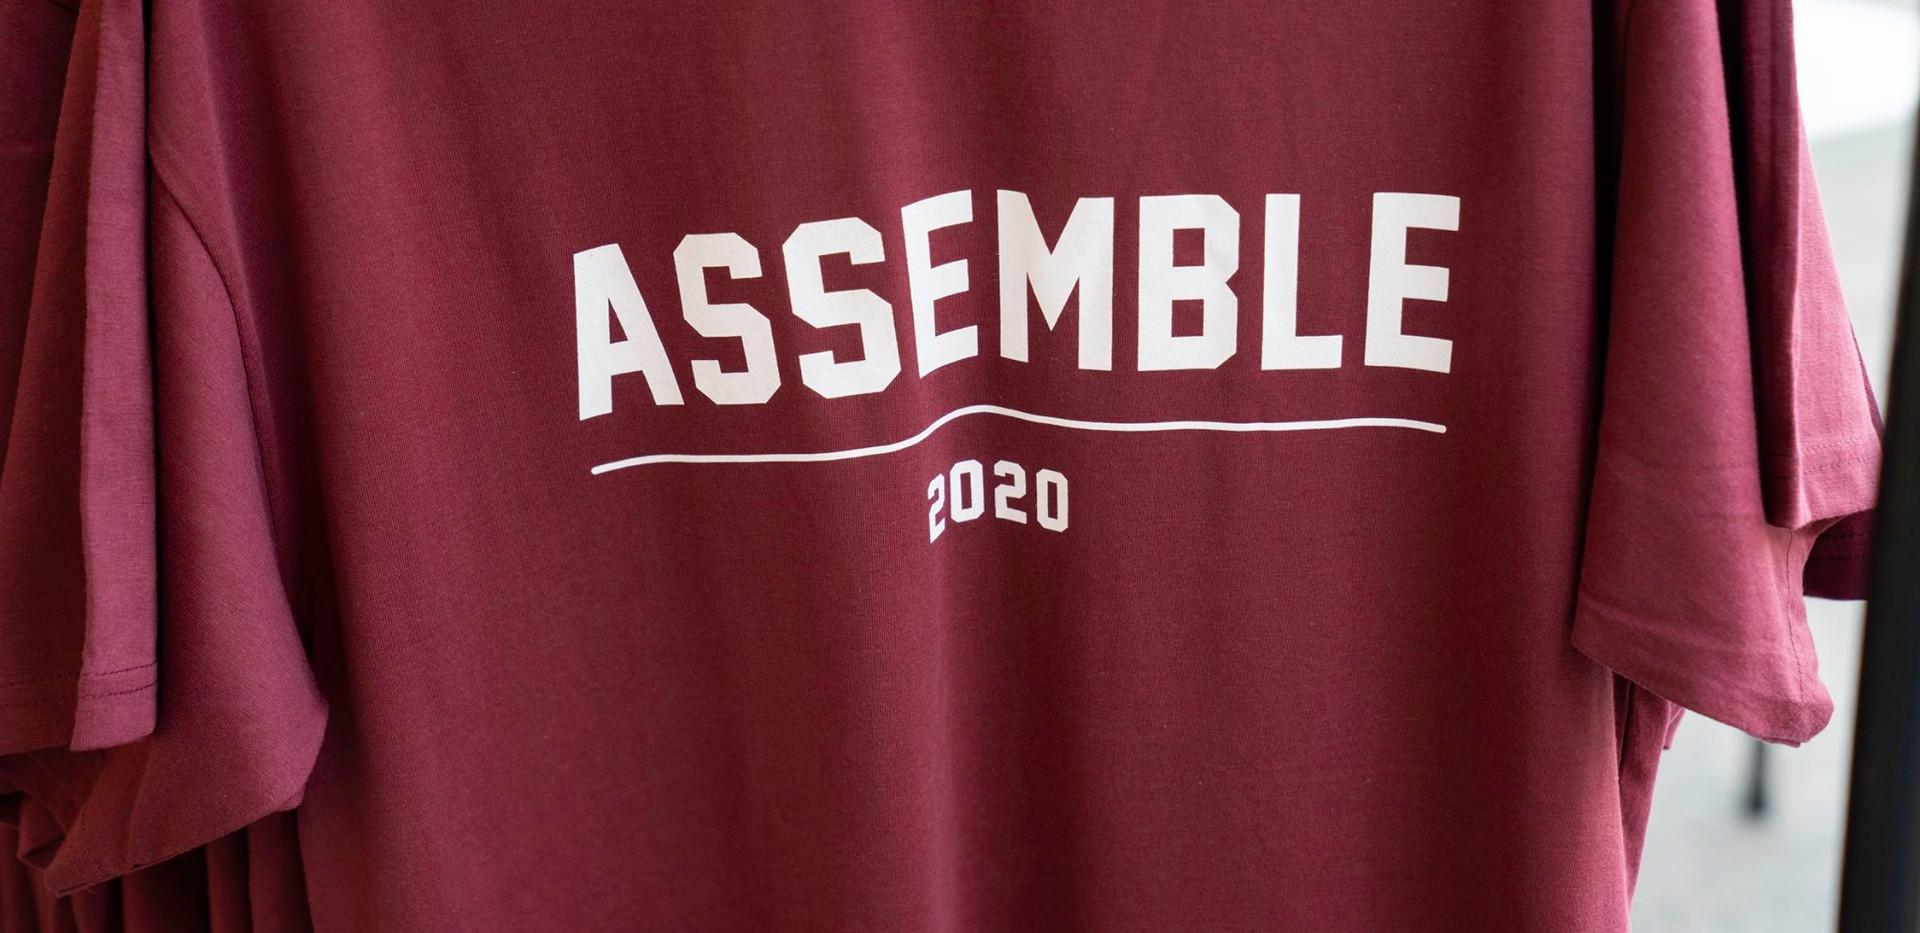 Assemble 2020